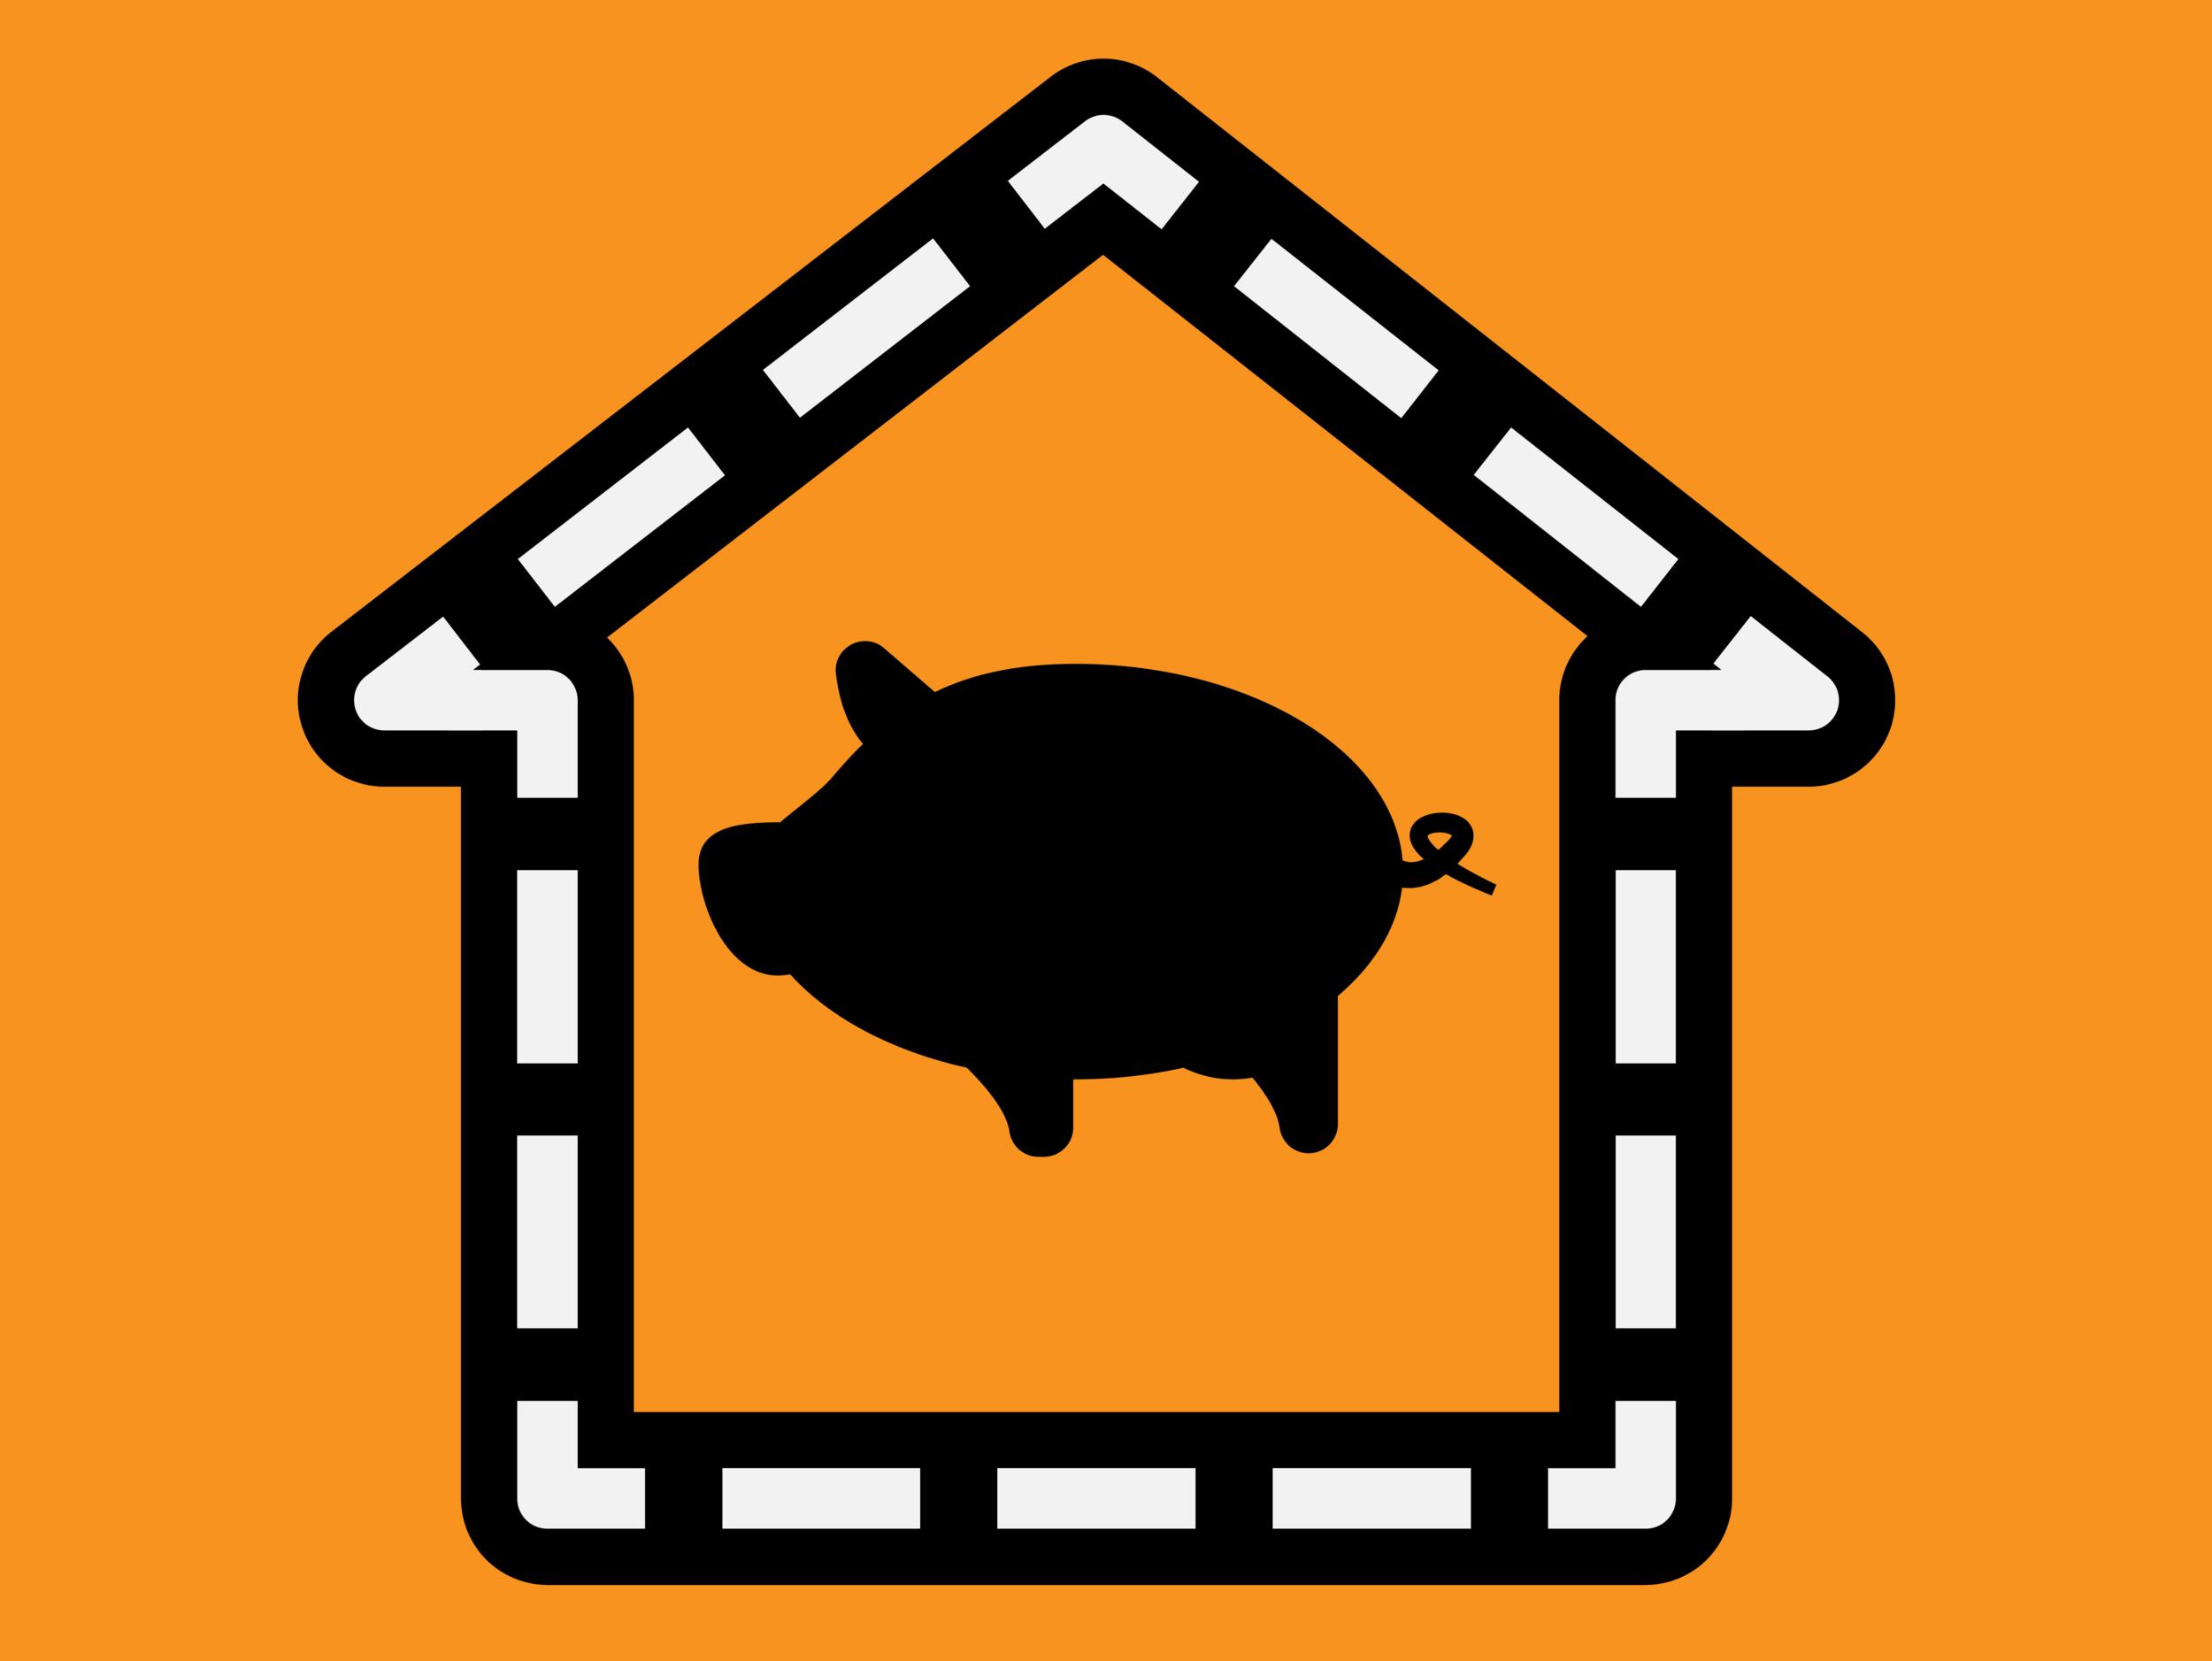 Big House Flicks_compact.png